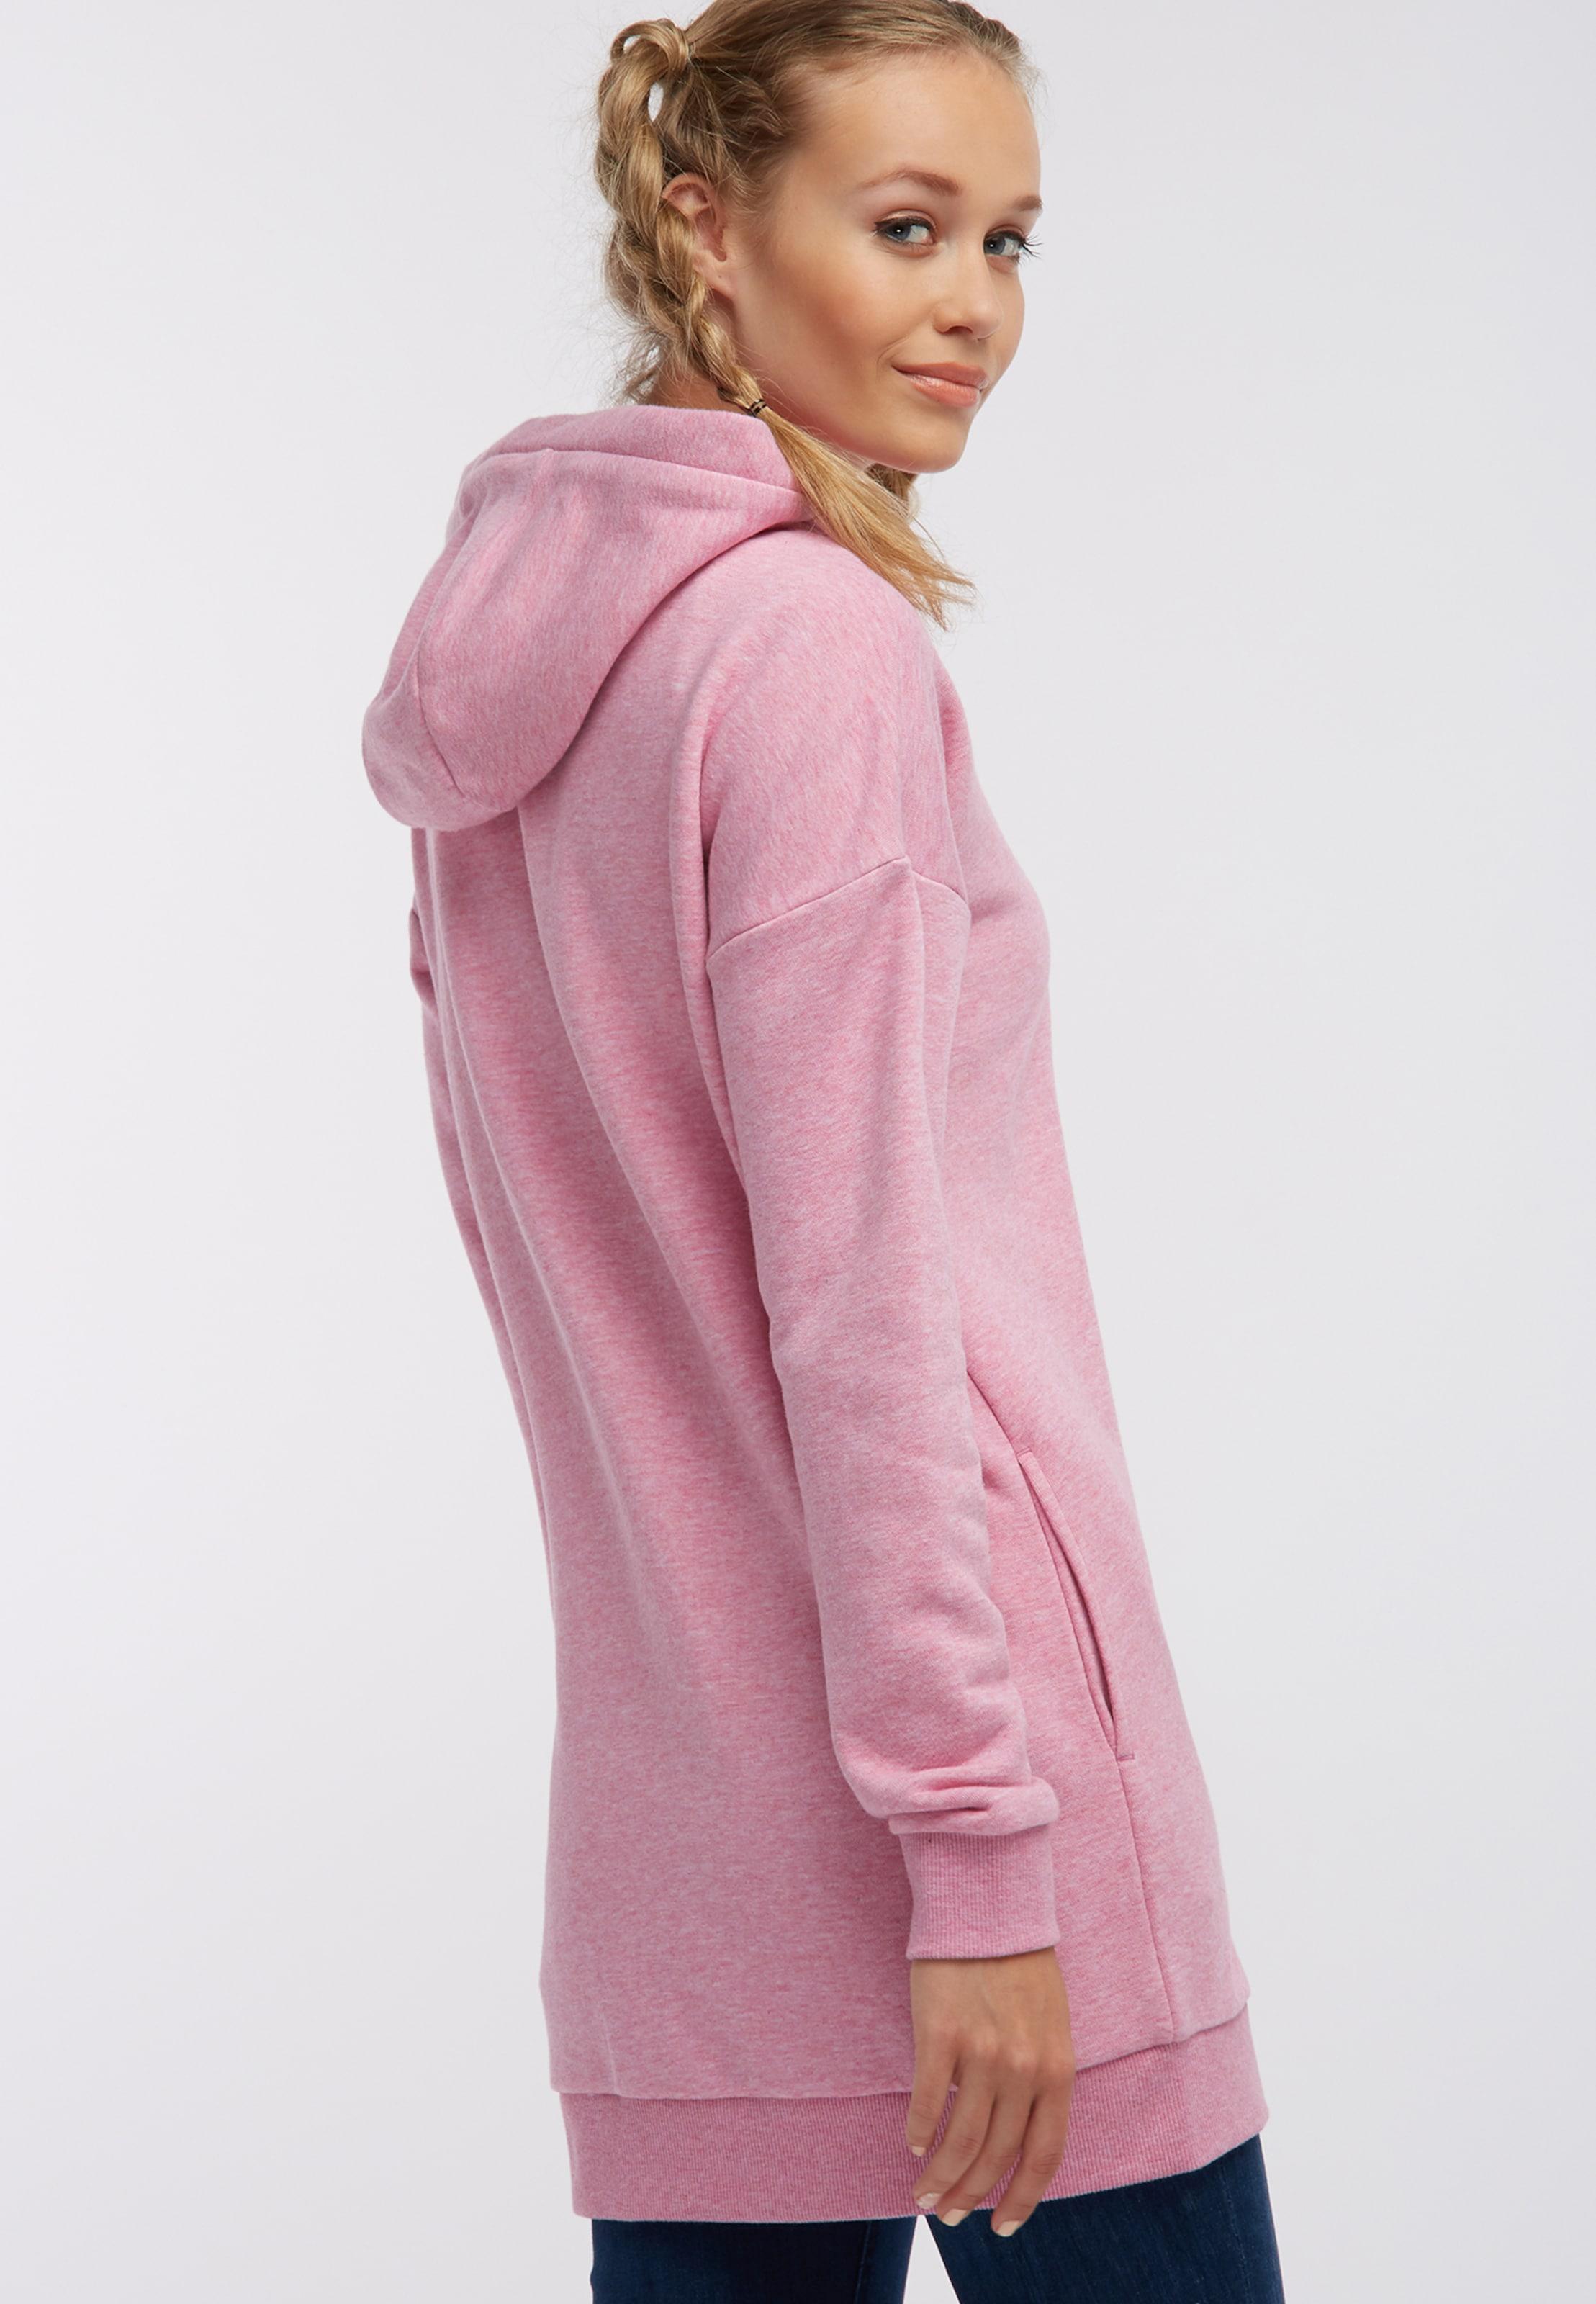 Pink Pink Mymo In In Mymo Sweatshirtjacke Mymo Sweatshirtjacke Sweatshirtjacke In tCBsQrdxoh